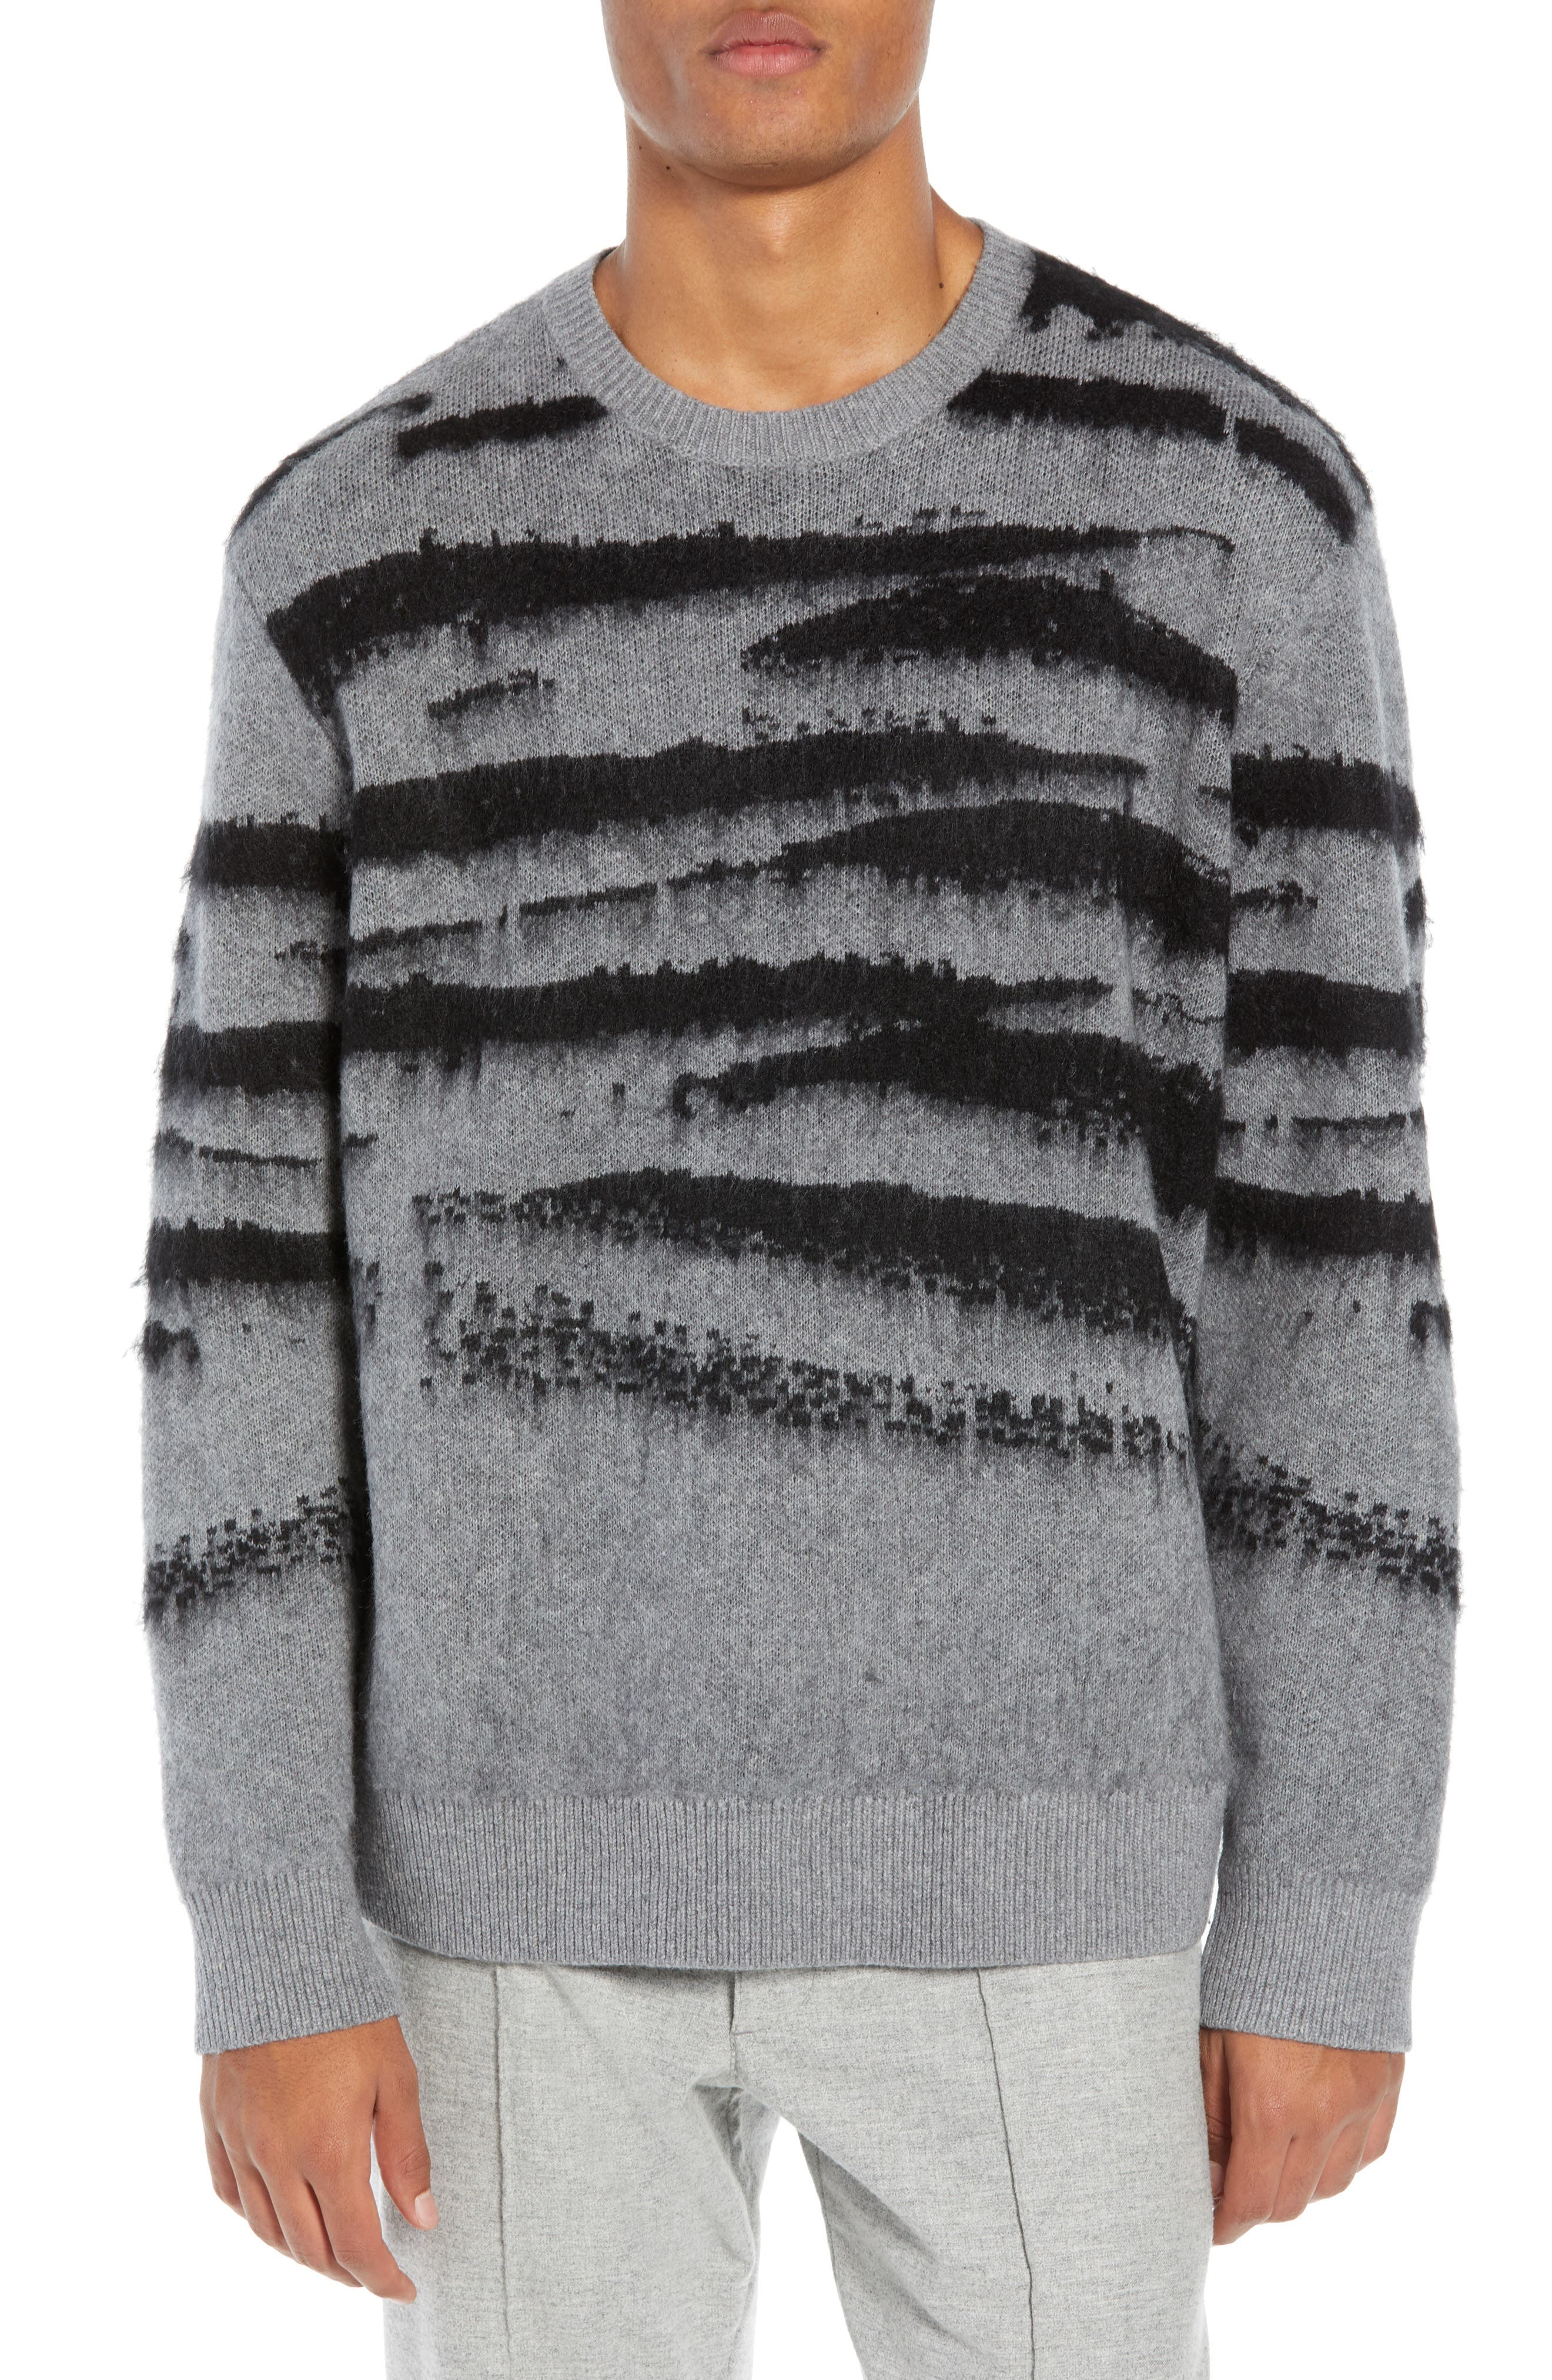 Ture Regular Fit Sweater,                         Main,                         color, GREY/ CINDER